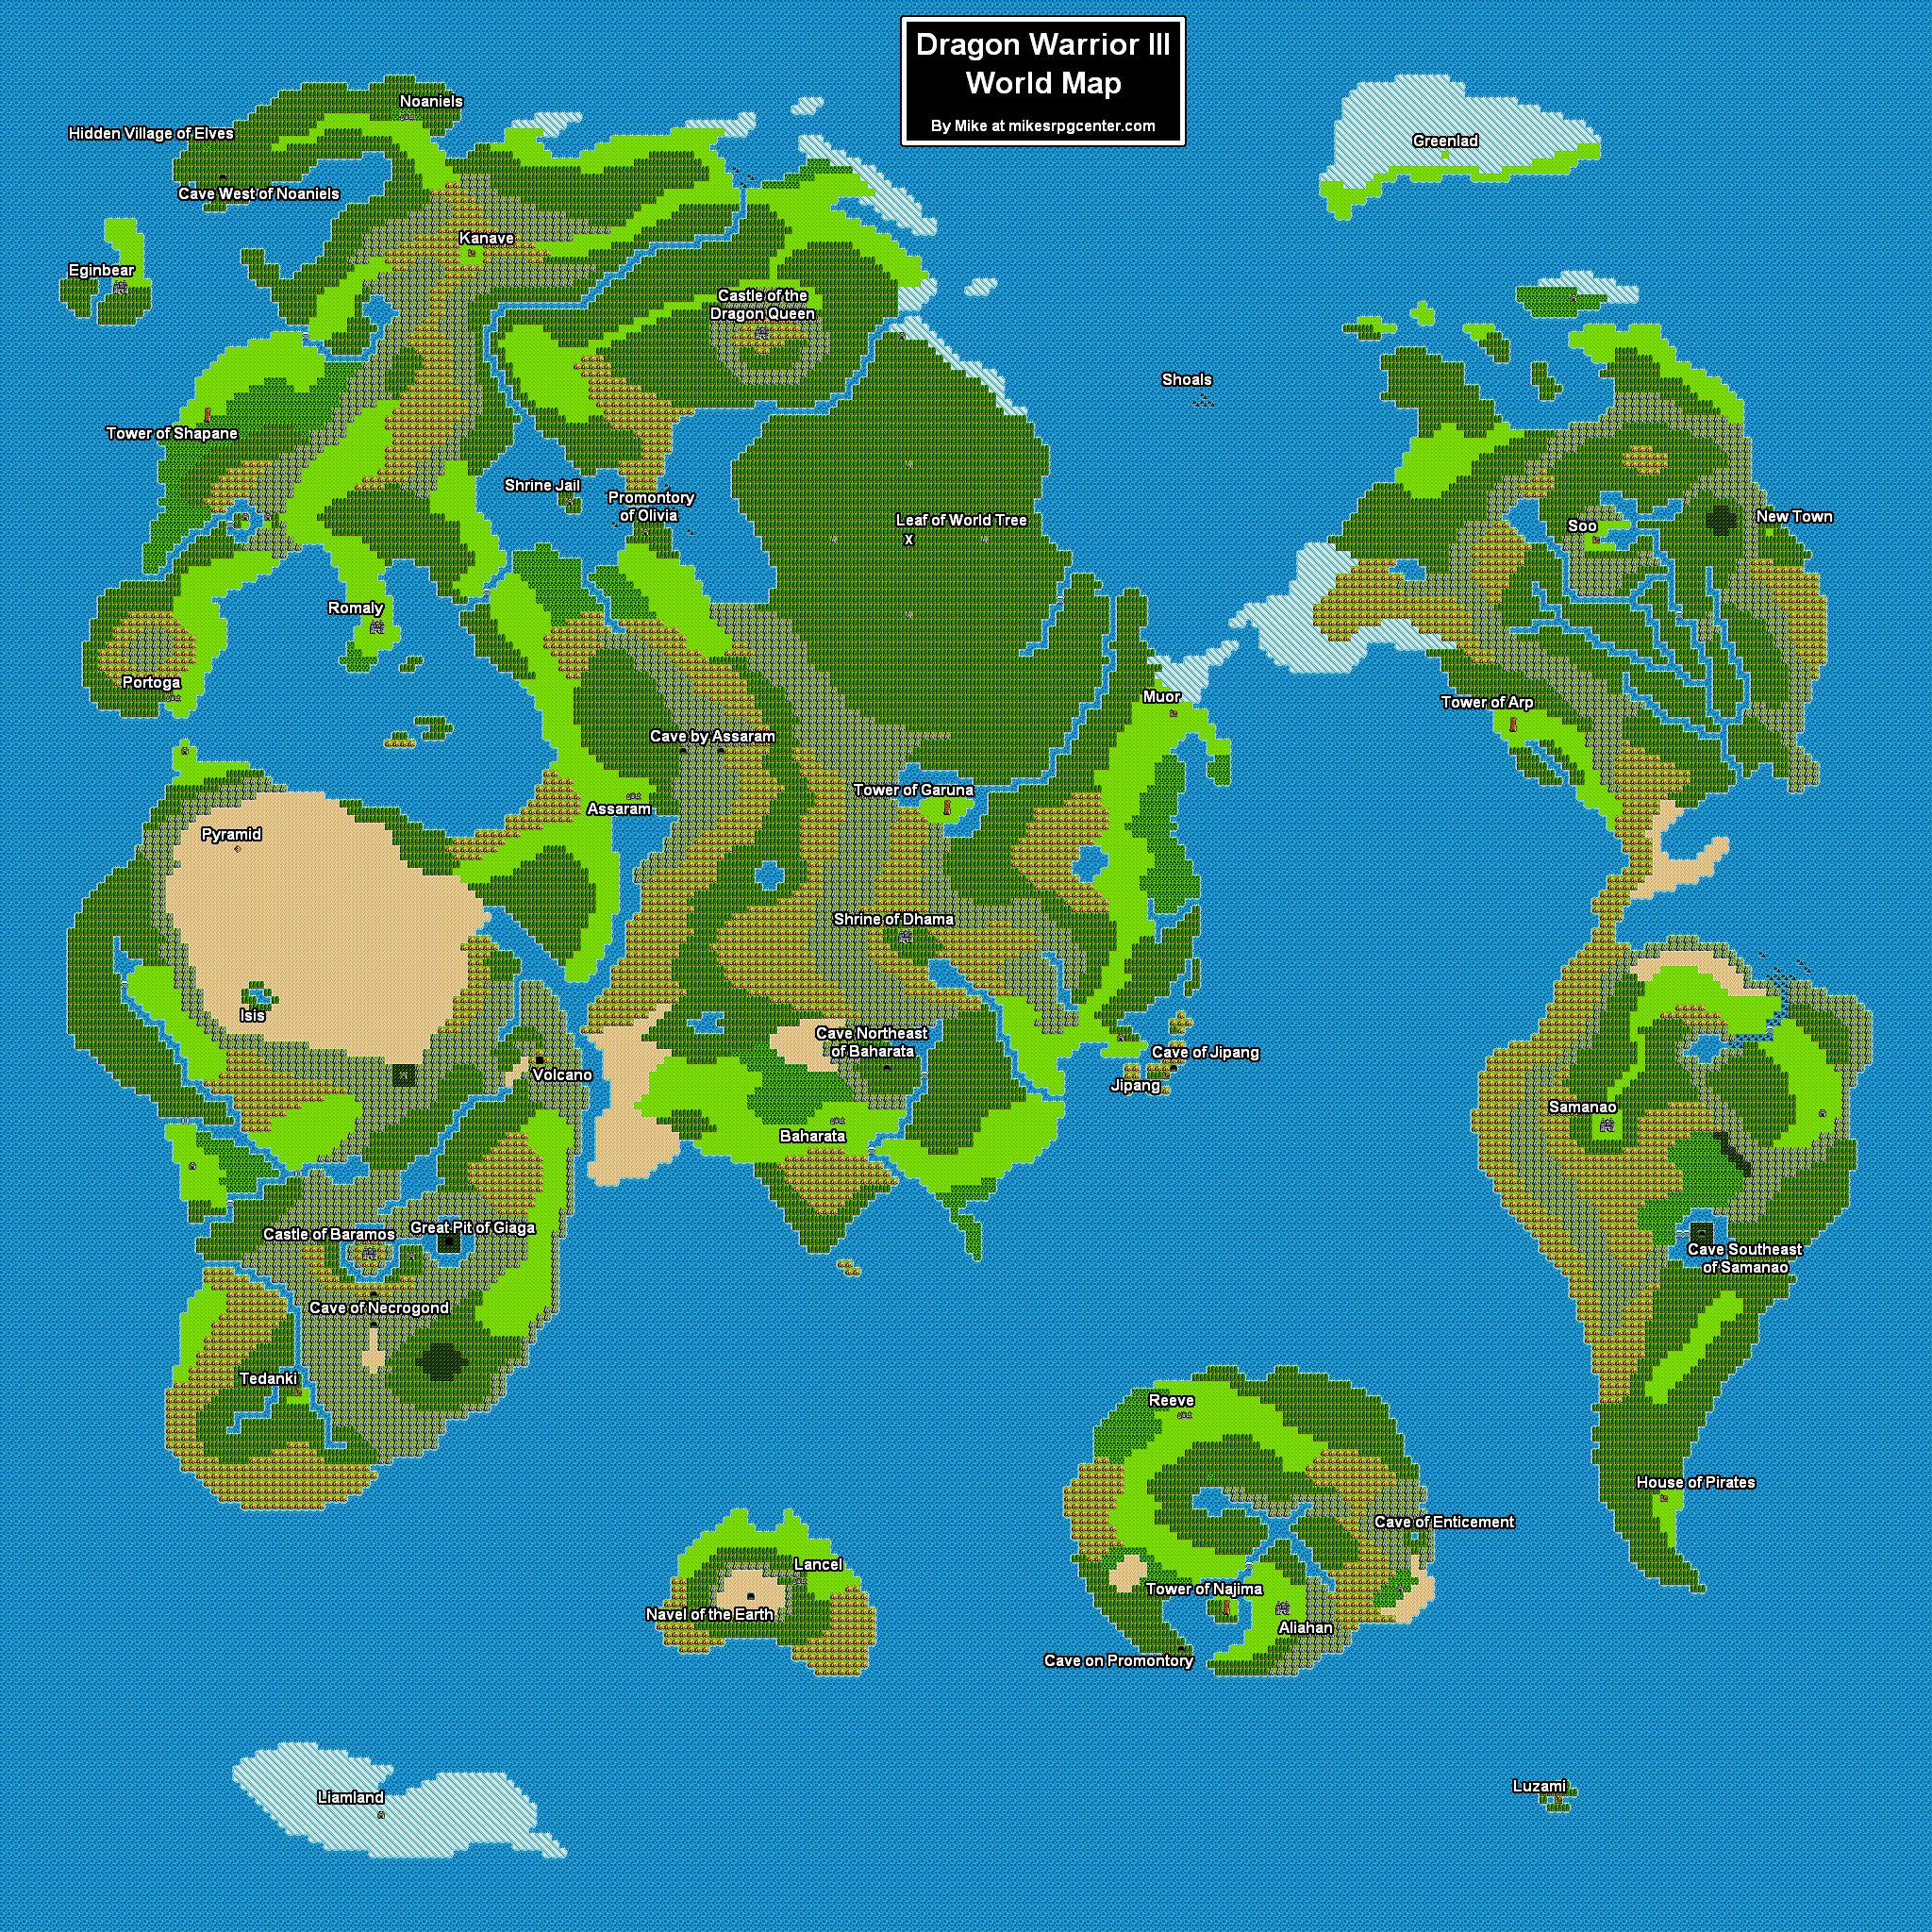 Mikes RPG Center Dragon Warrior III - World map 3